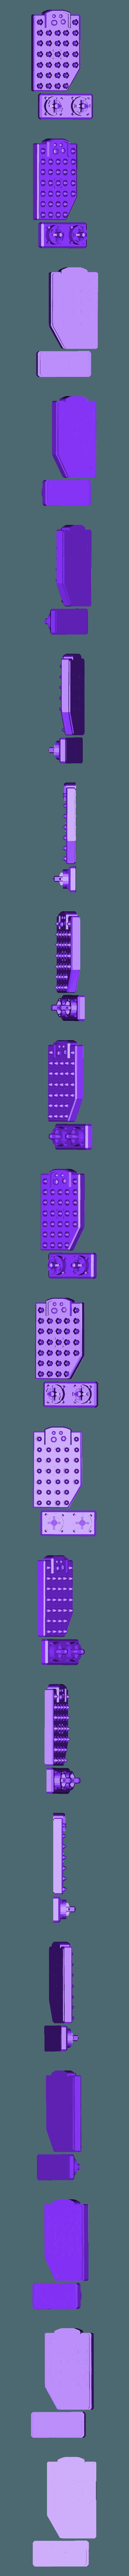 19Storm_Surge_shoulder_facesX2_repaired.stl Download free OBJ file Tempest Rush Mech • 3D printer model, Leesedrenfort